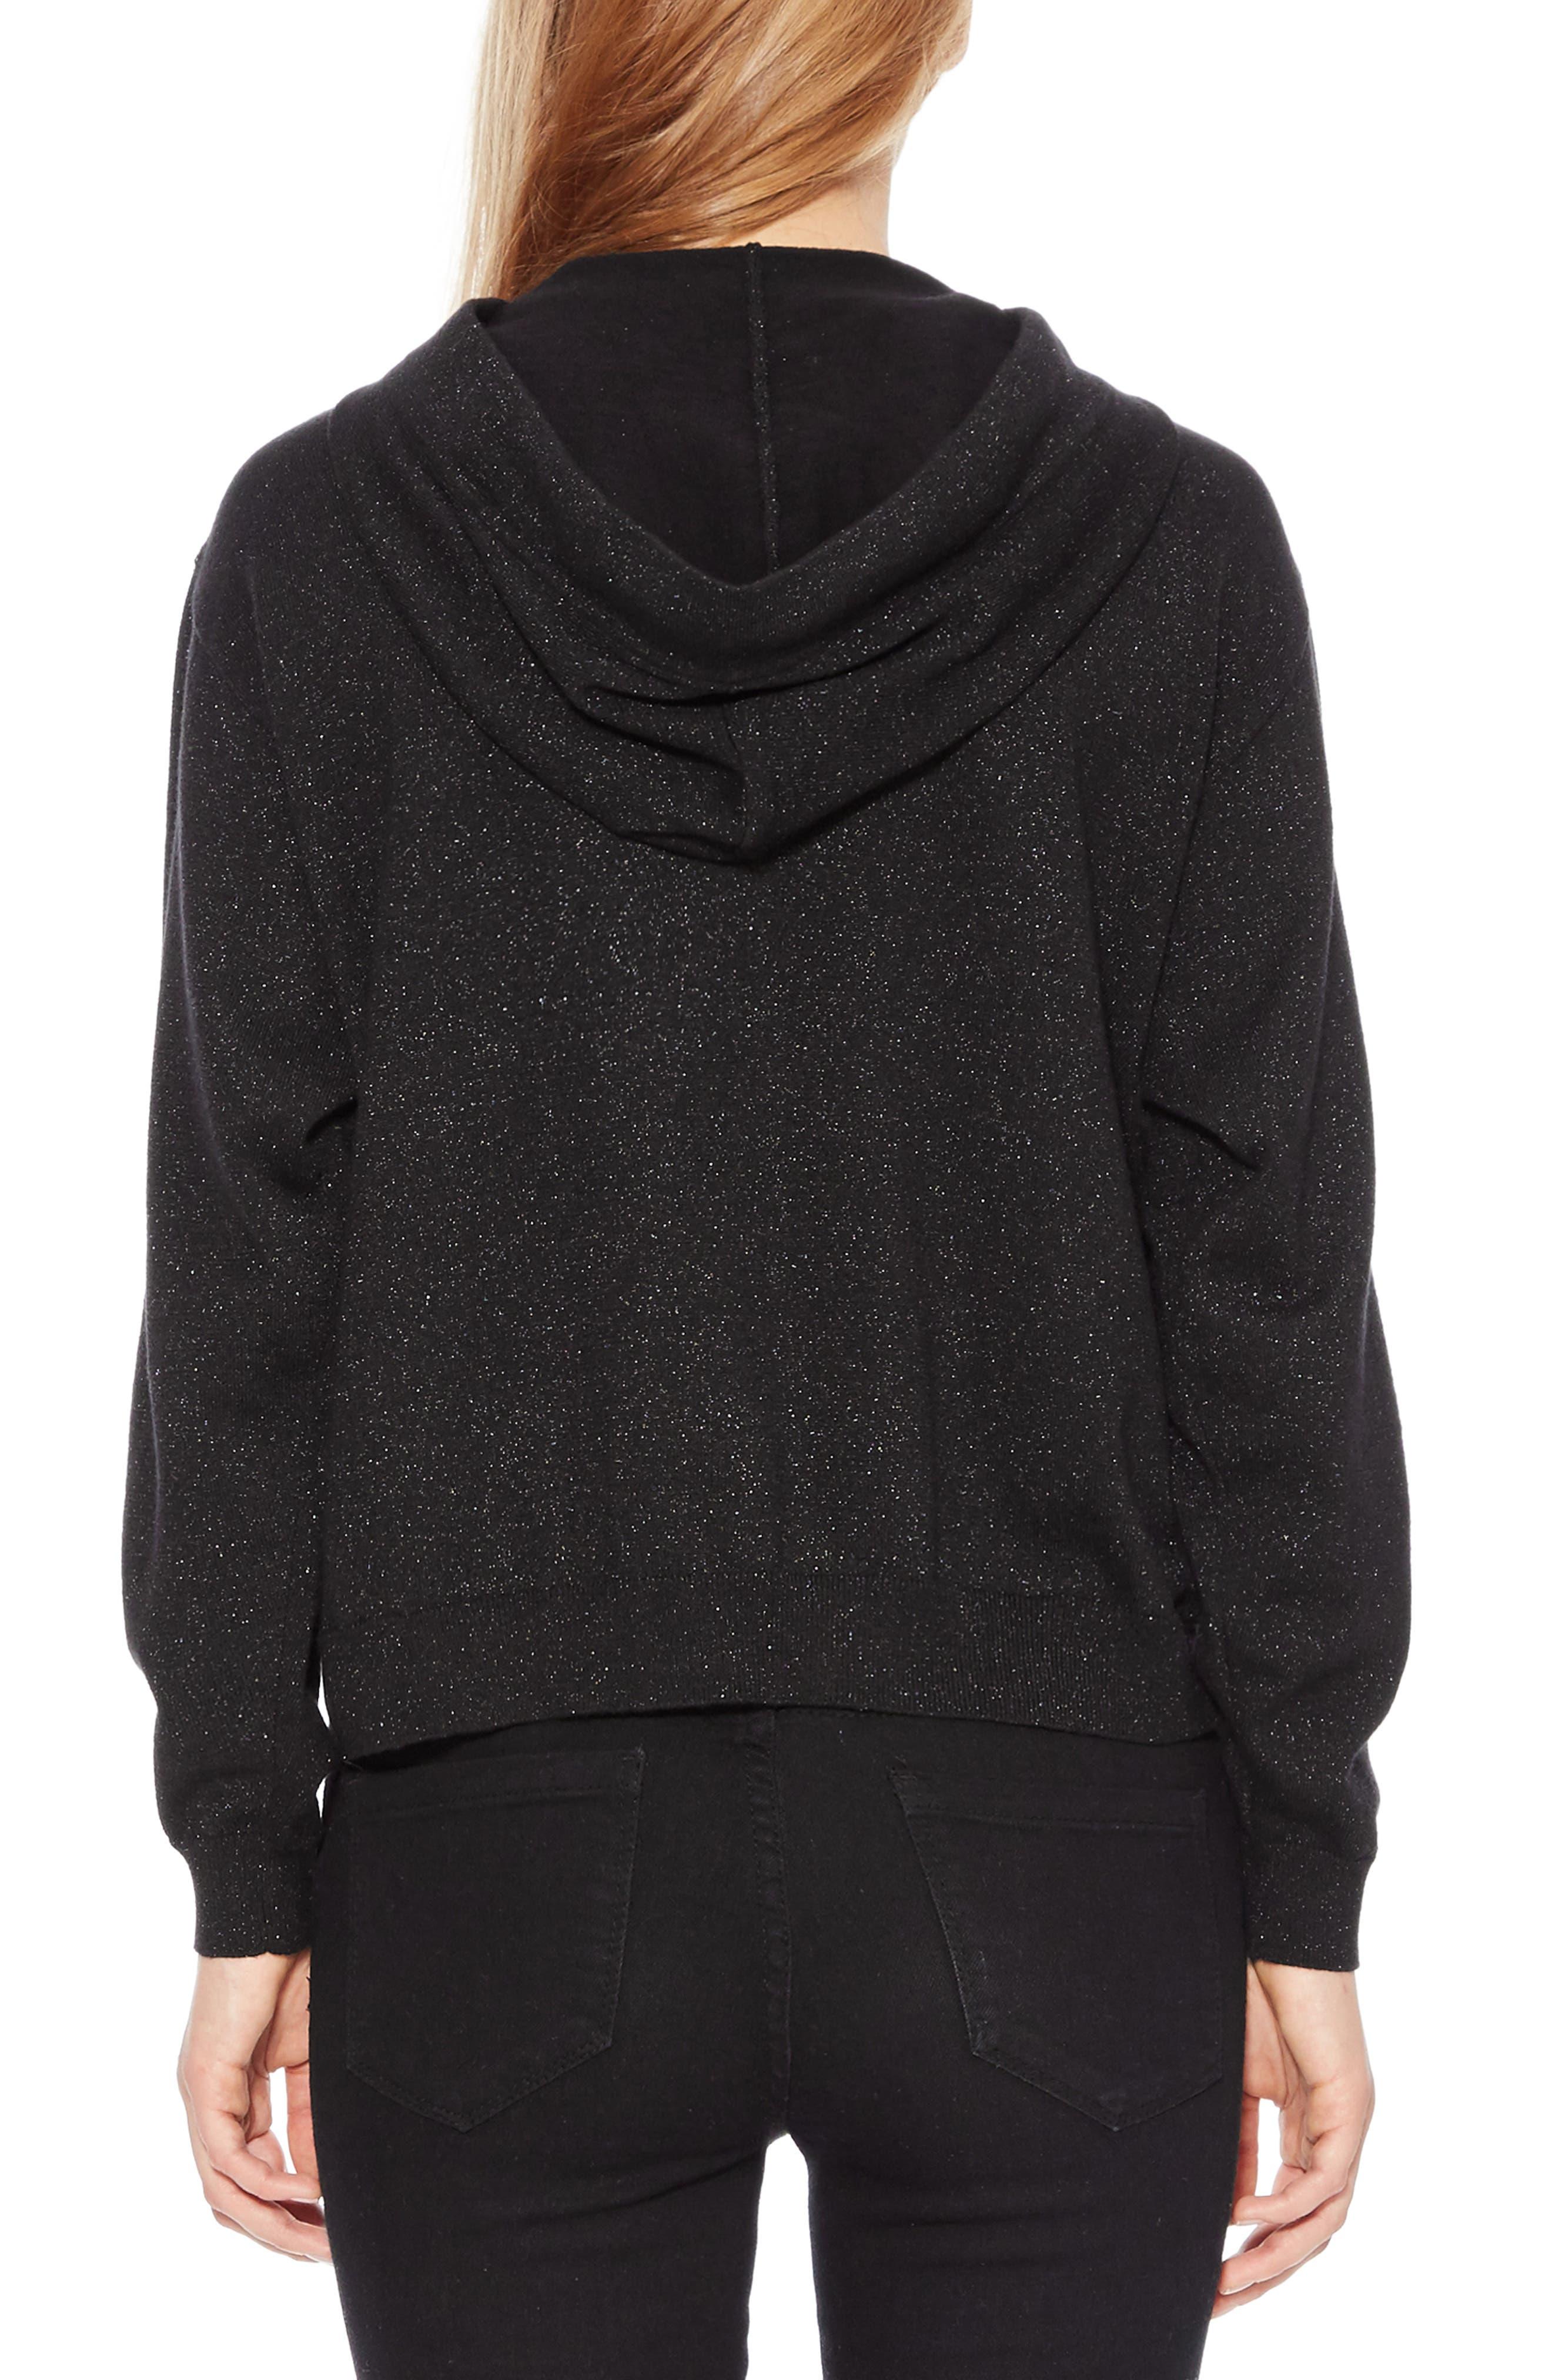 Nolan Sequin Hooded Sweatshirt,                             Alternate thumbnail 2, color,                             001